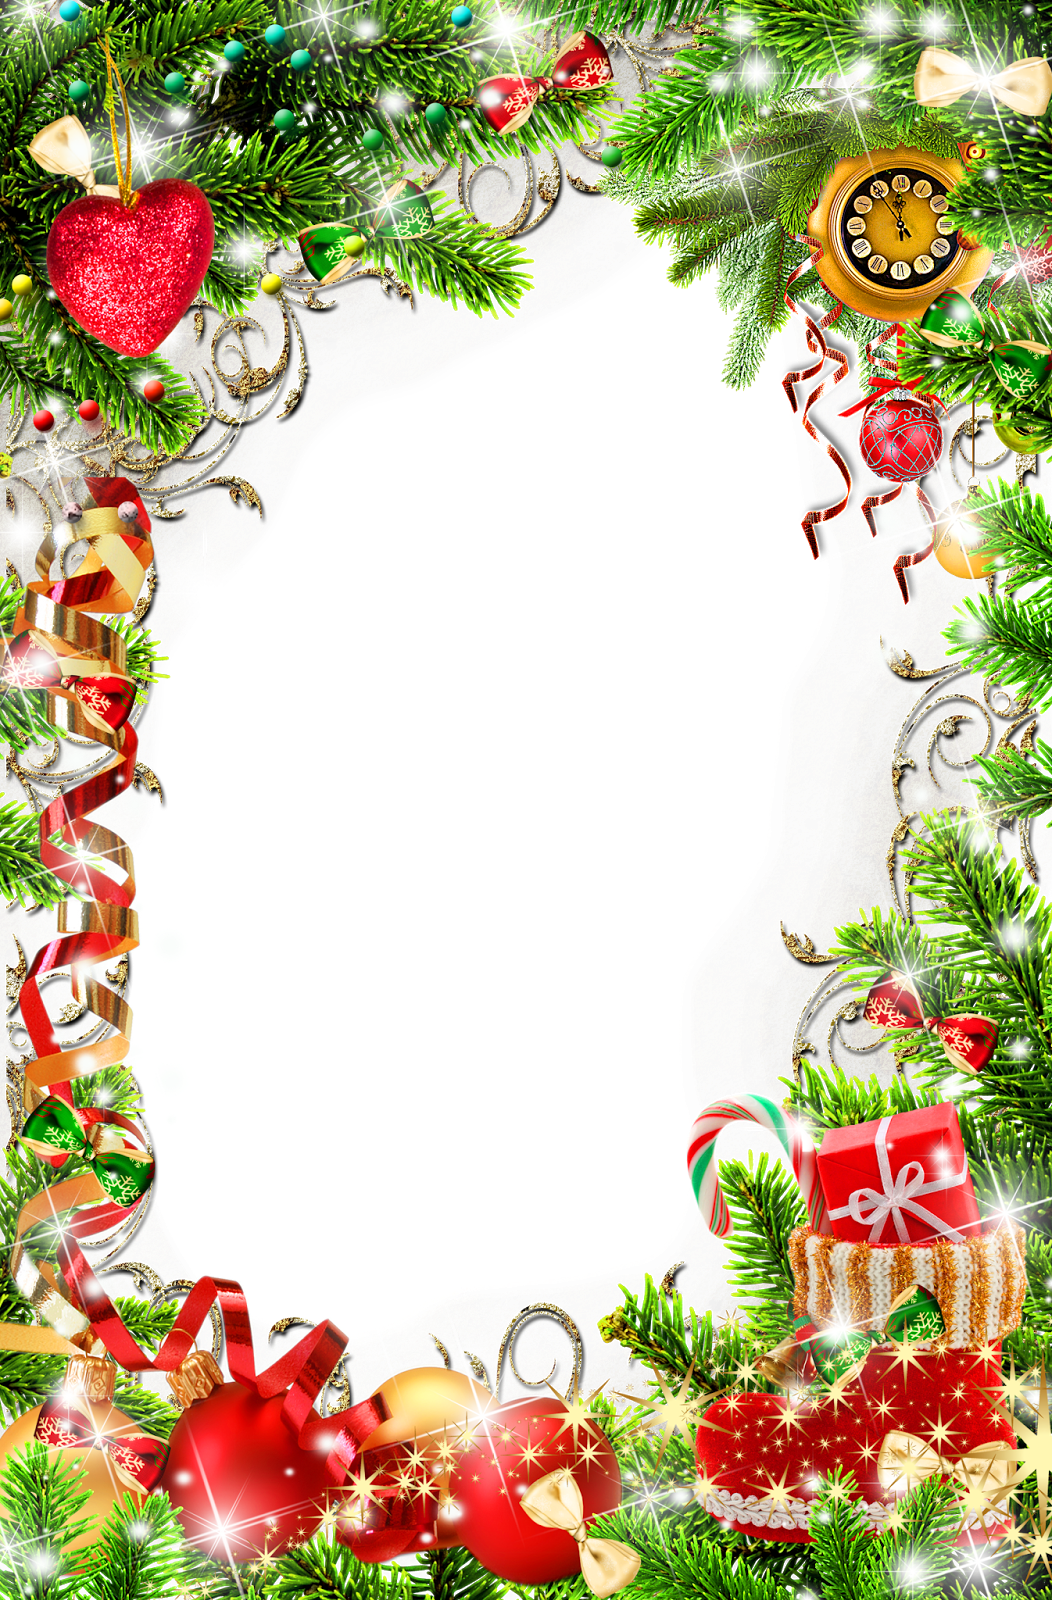 2012 A Kimi Christmas Page 2! by ThatsMimi - imikimi.com ...